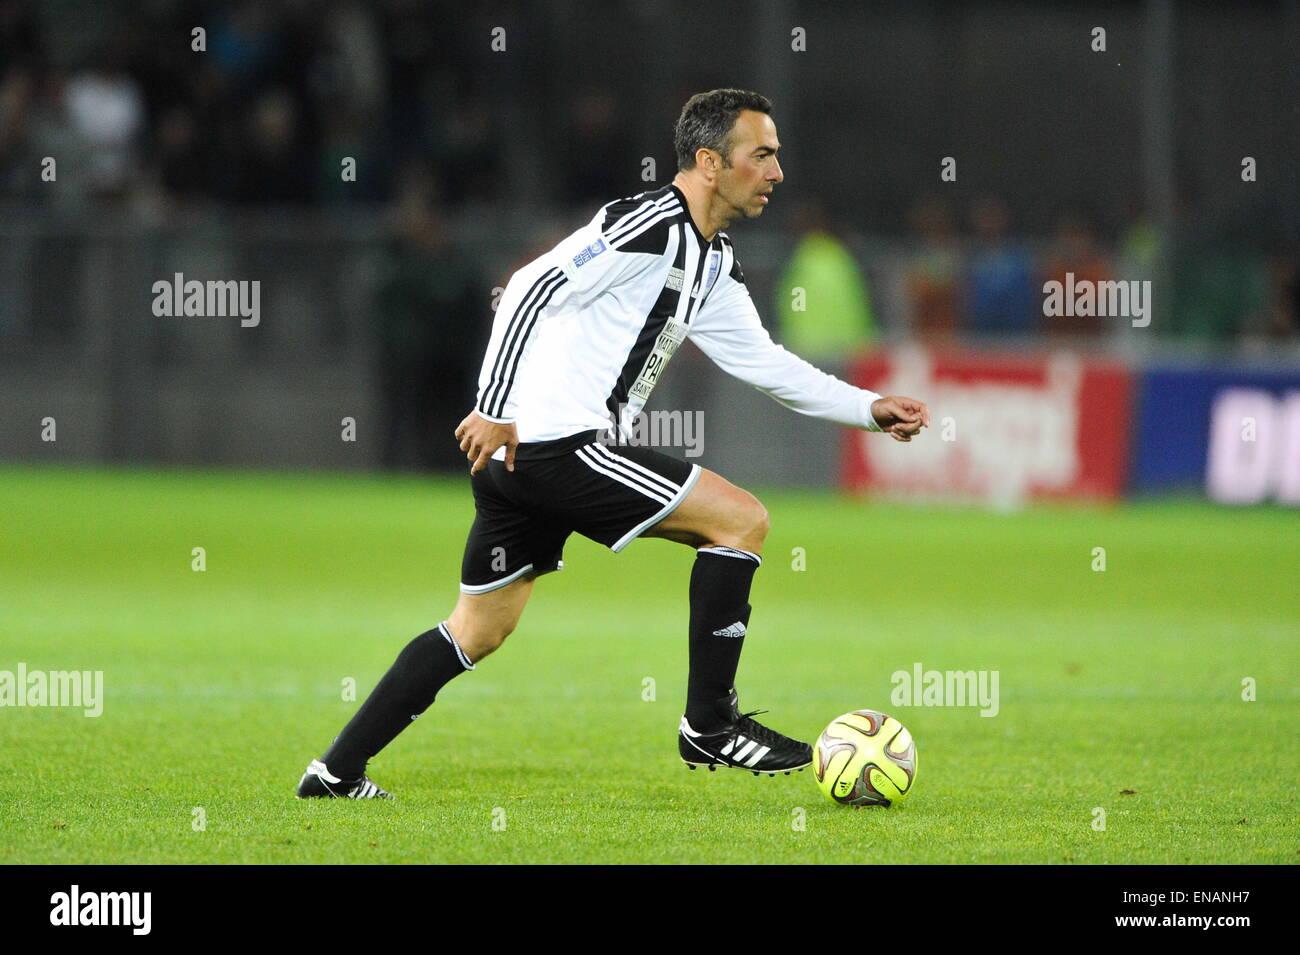 Yuri Djorkaeff: biography of the French football player 60